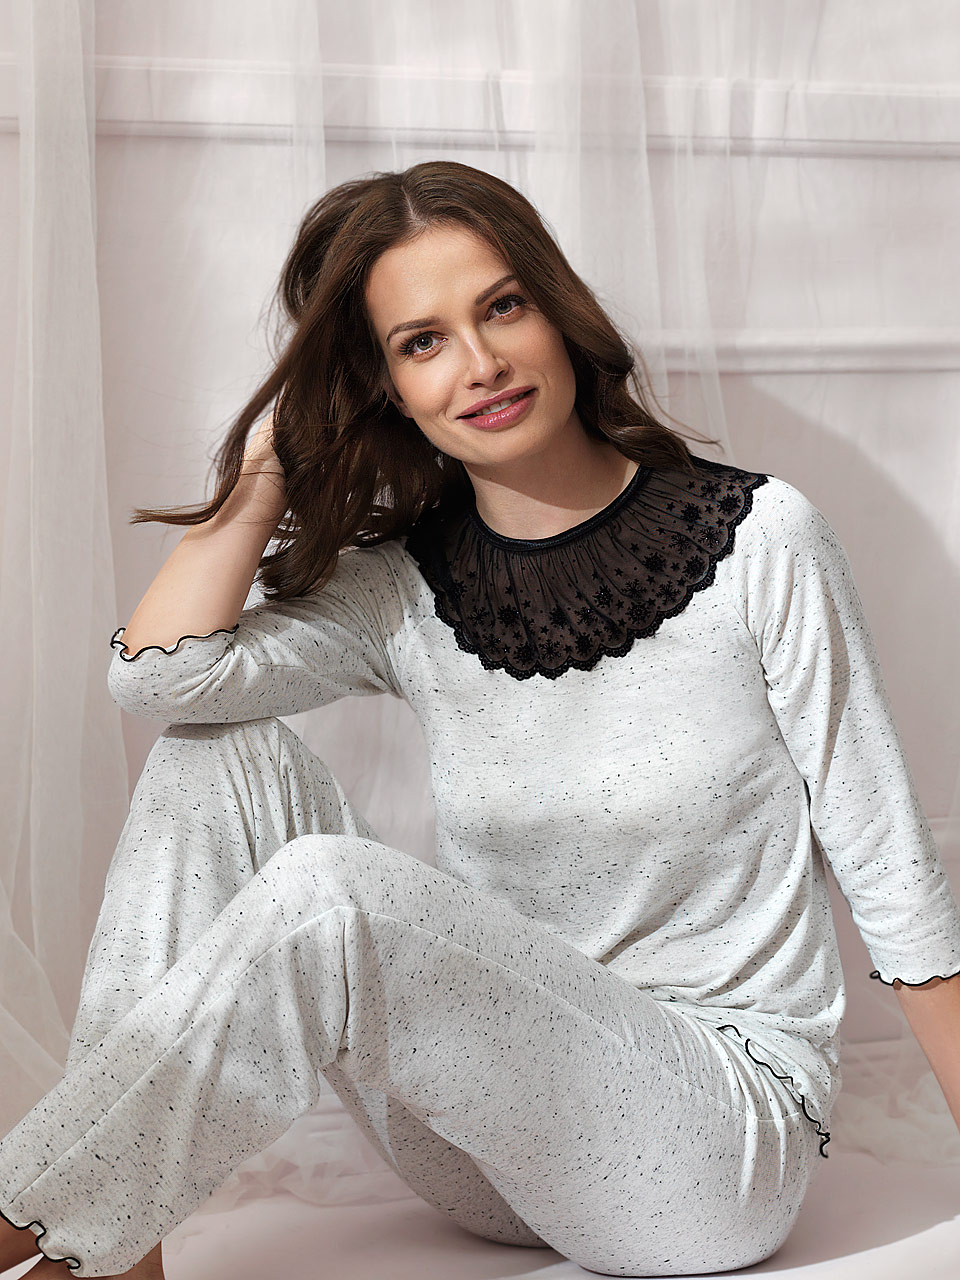 FD / Snowflake 2822 Pigiama<br />59 Cream / Black Thread, 60 Grey / Black Thread